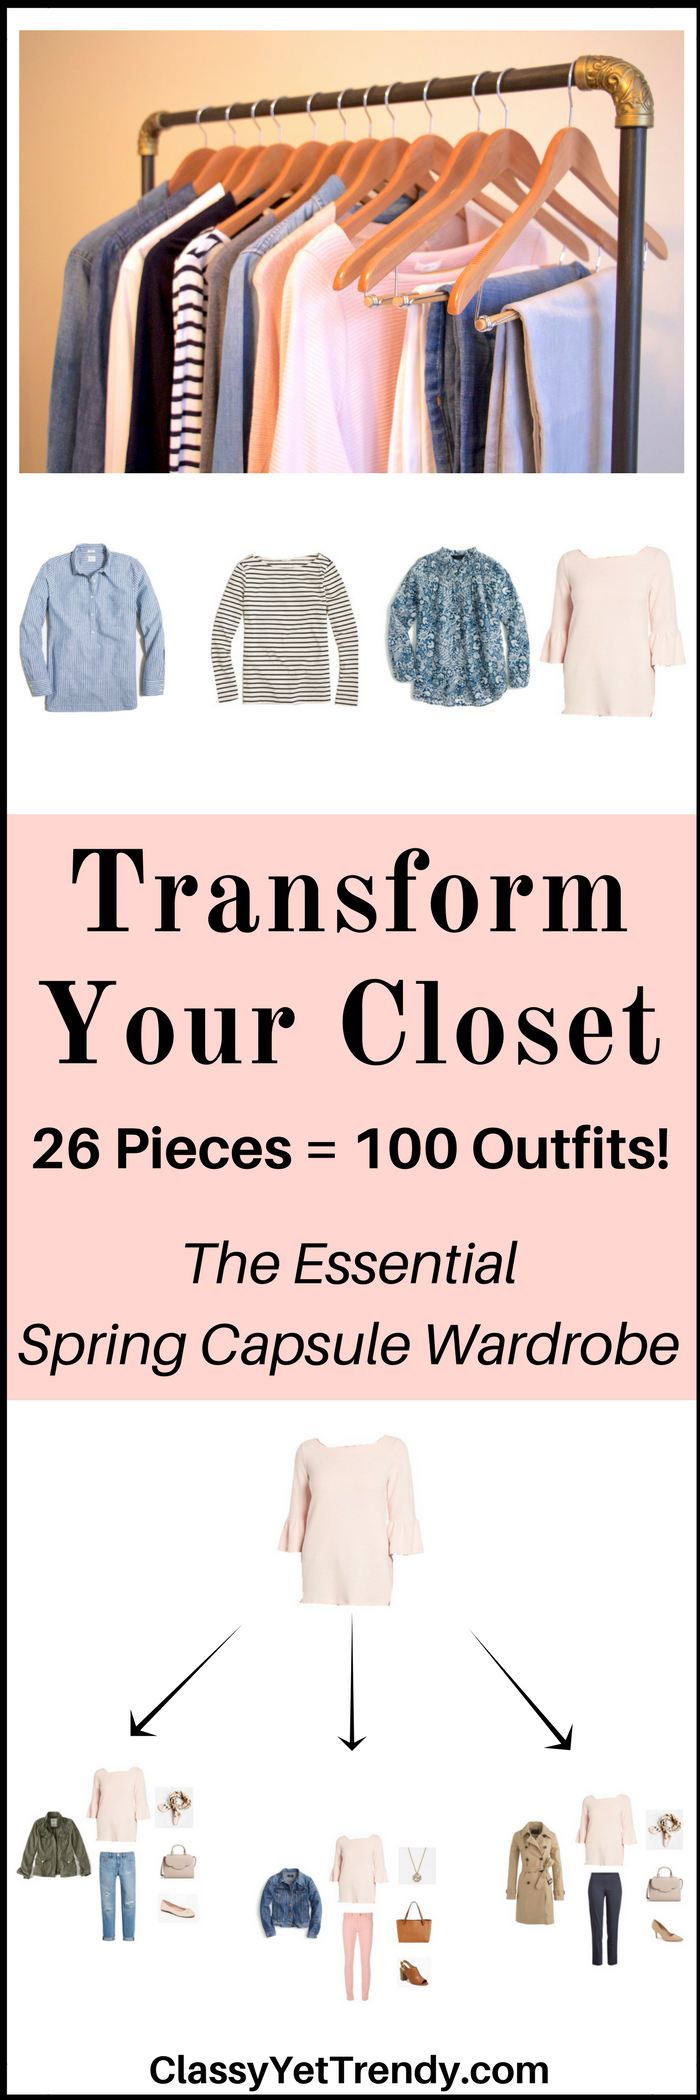 Essential Capsule Wardrobe e-book- Spring 2017